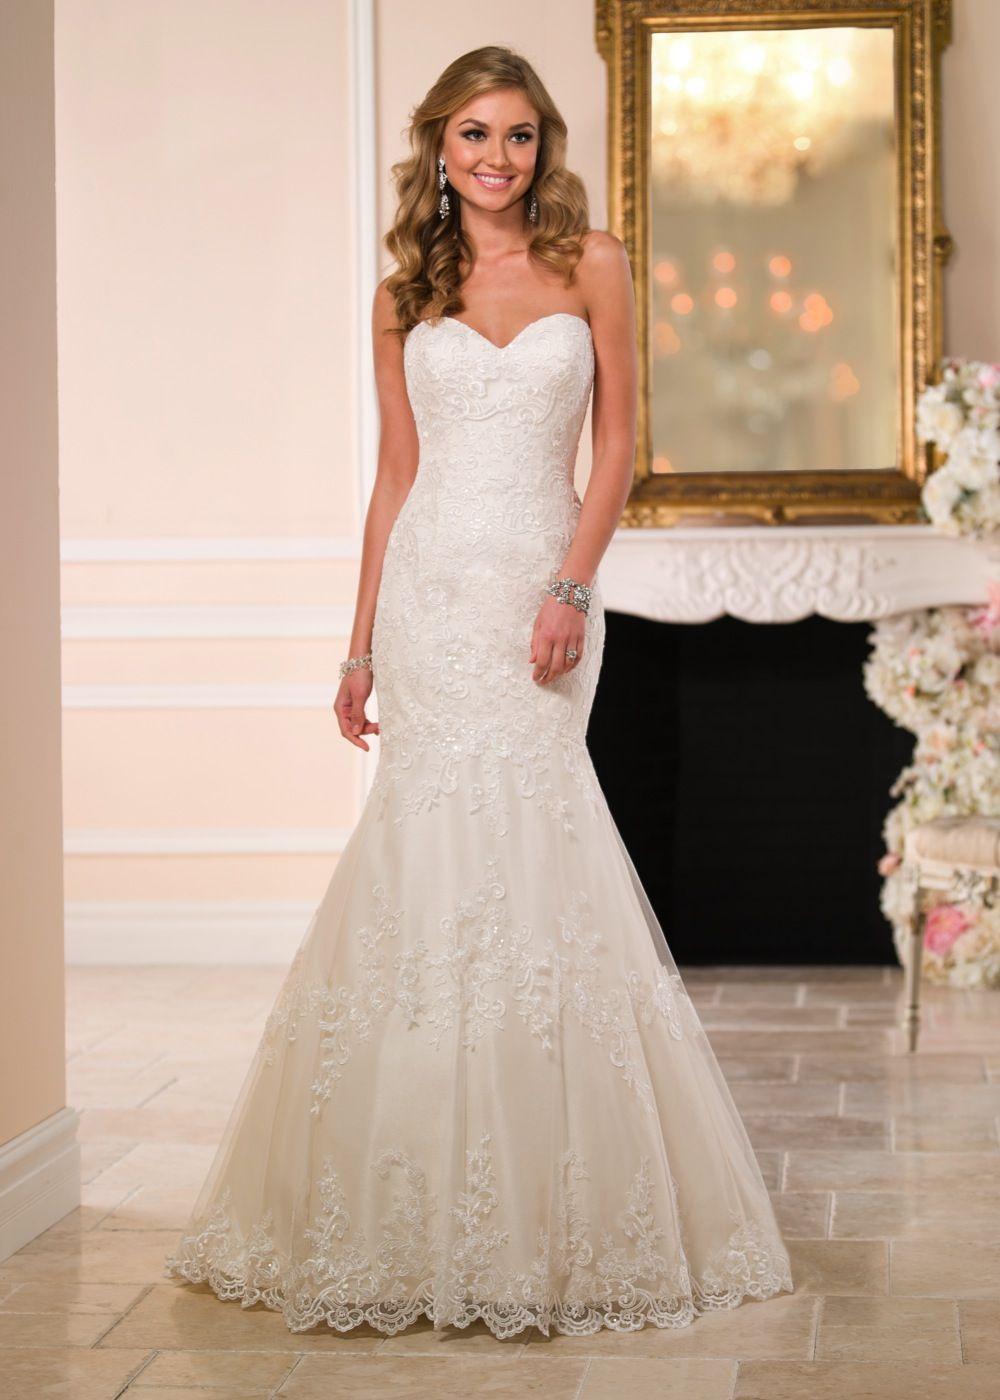 Glamorous stella york wedding dresses stella york wedding